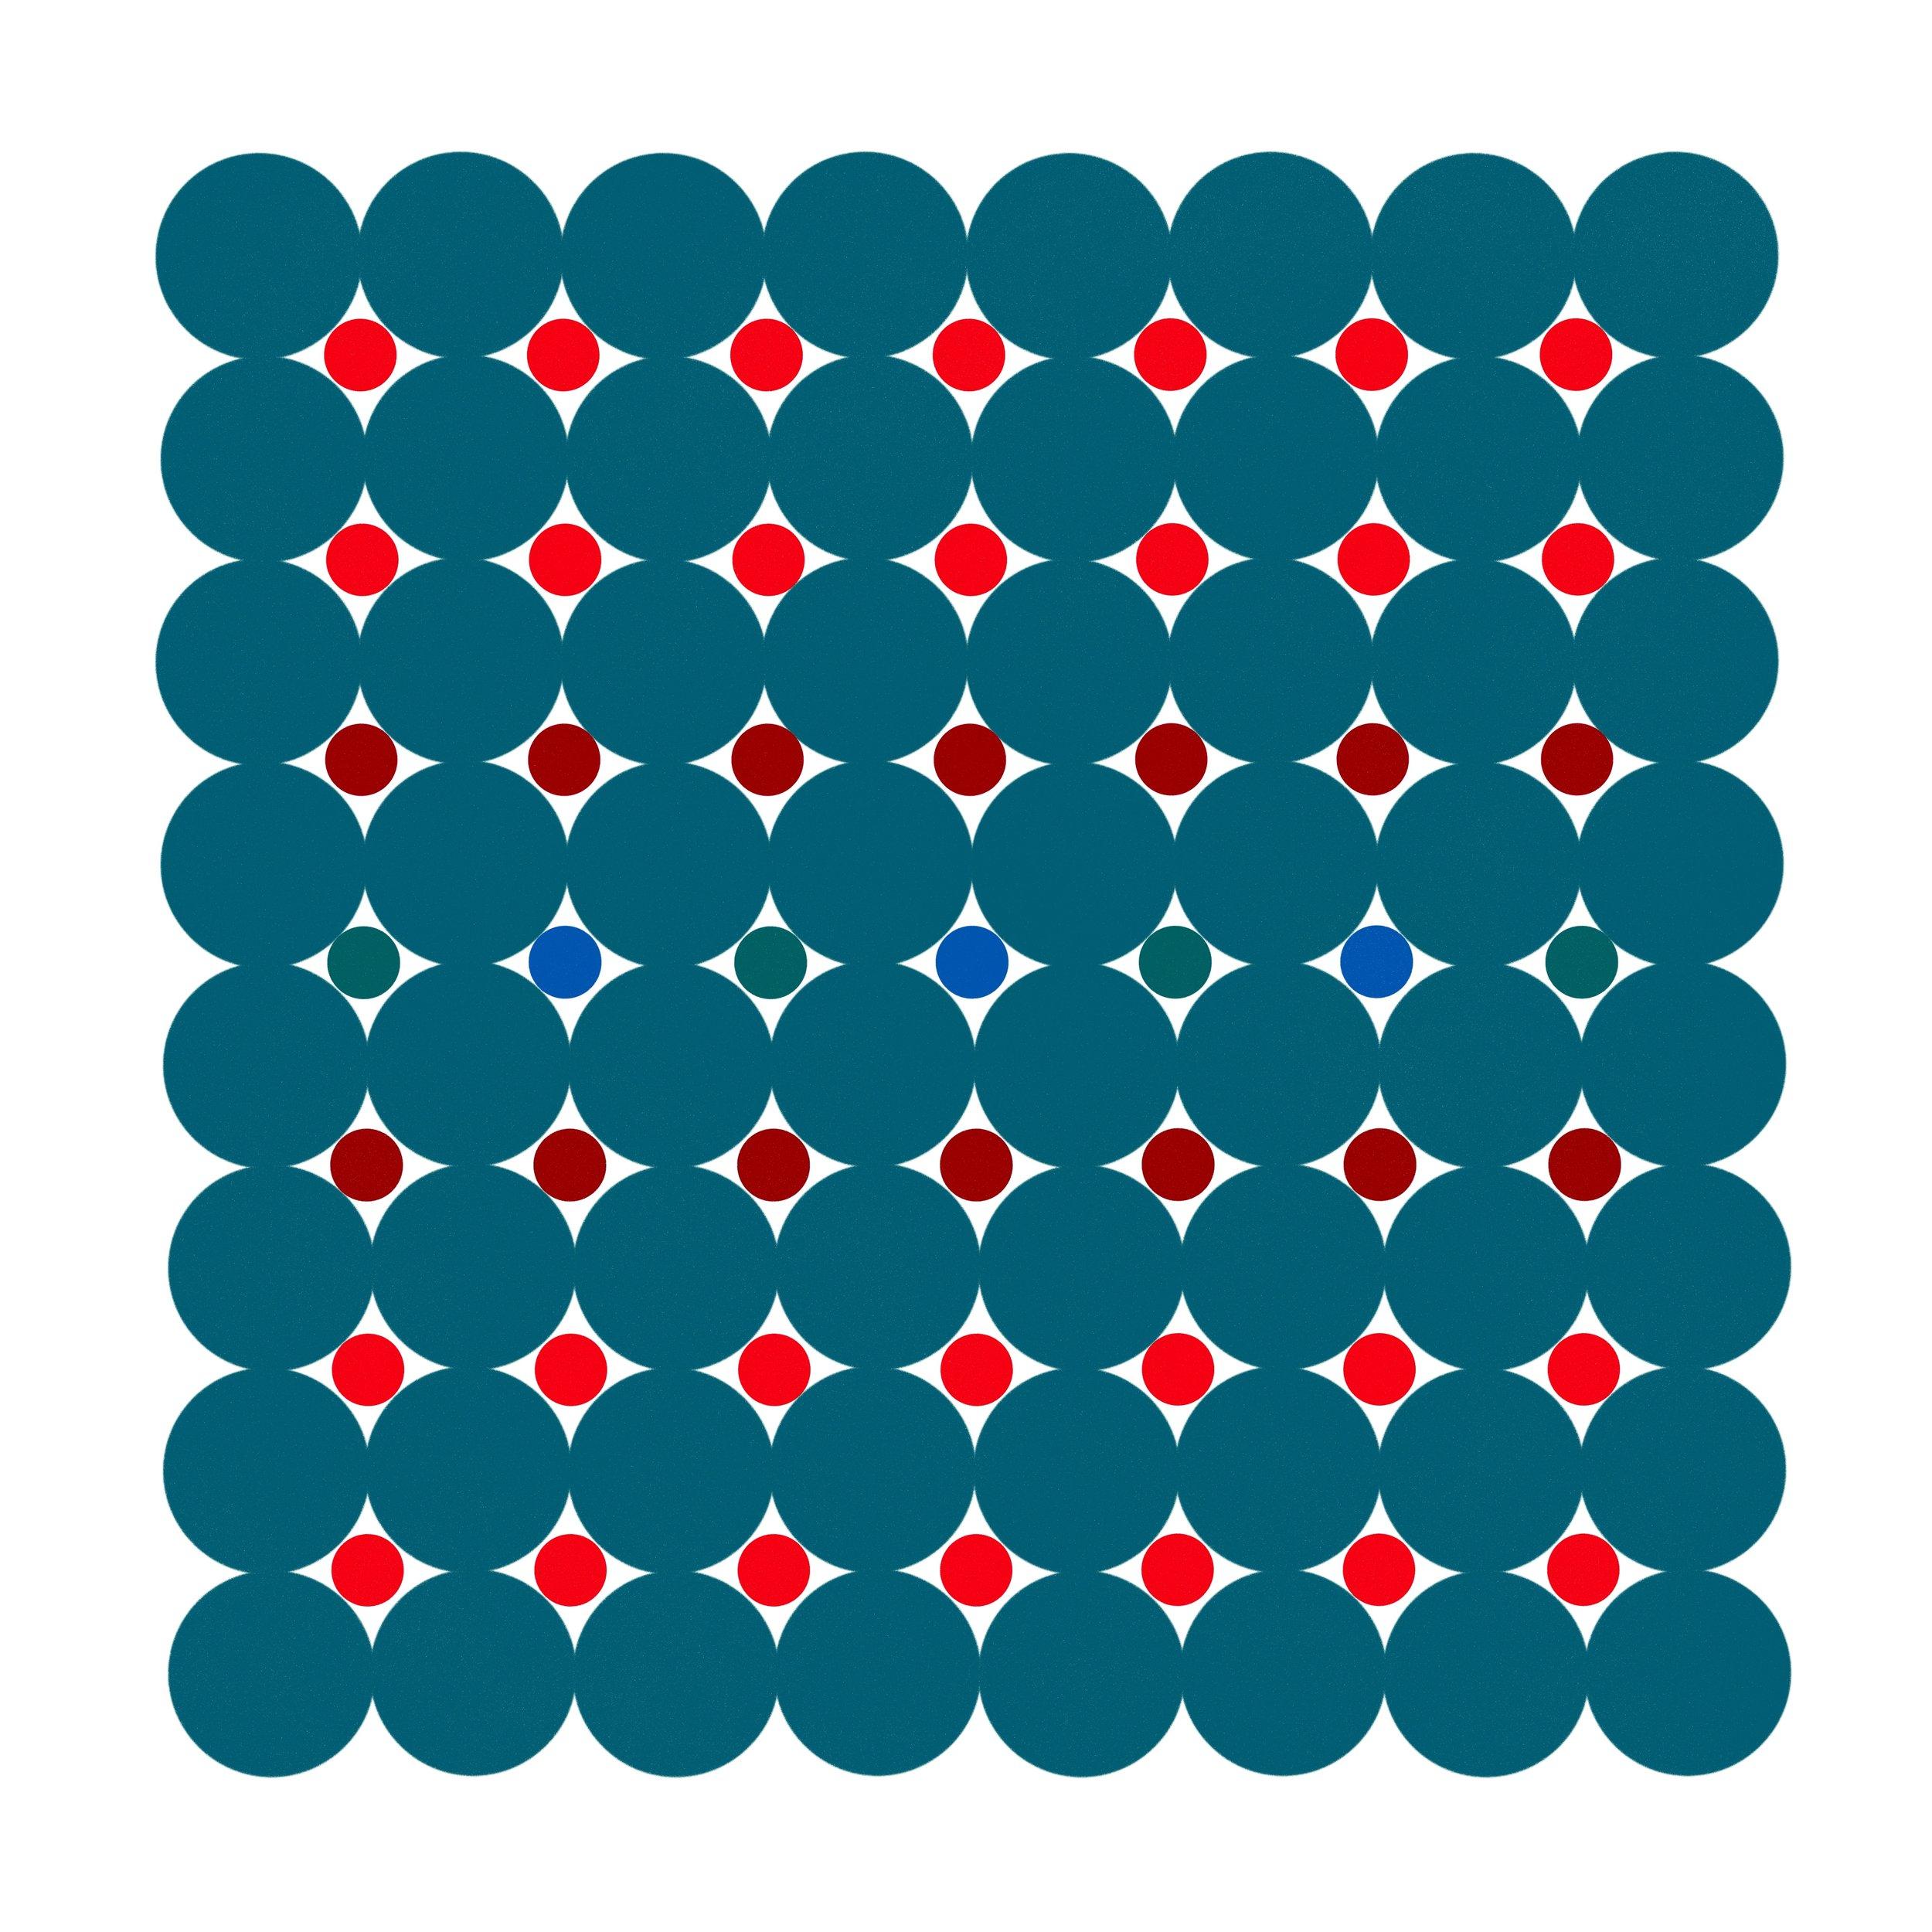 Dot Structure 4 - Deep Teal